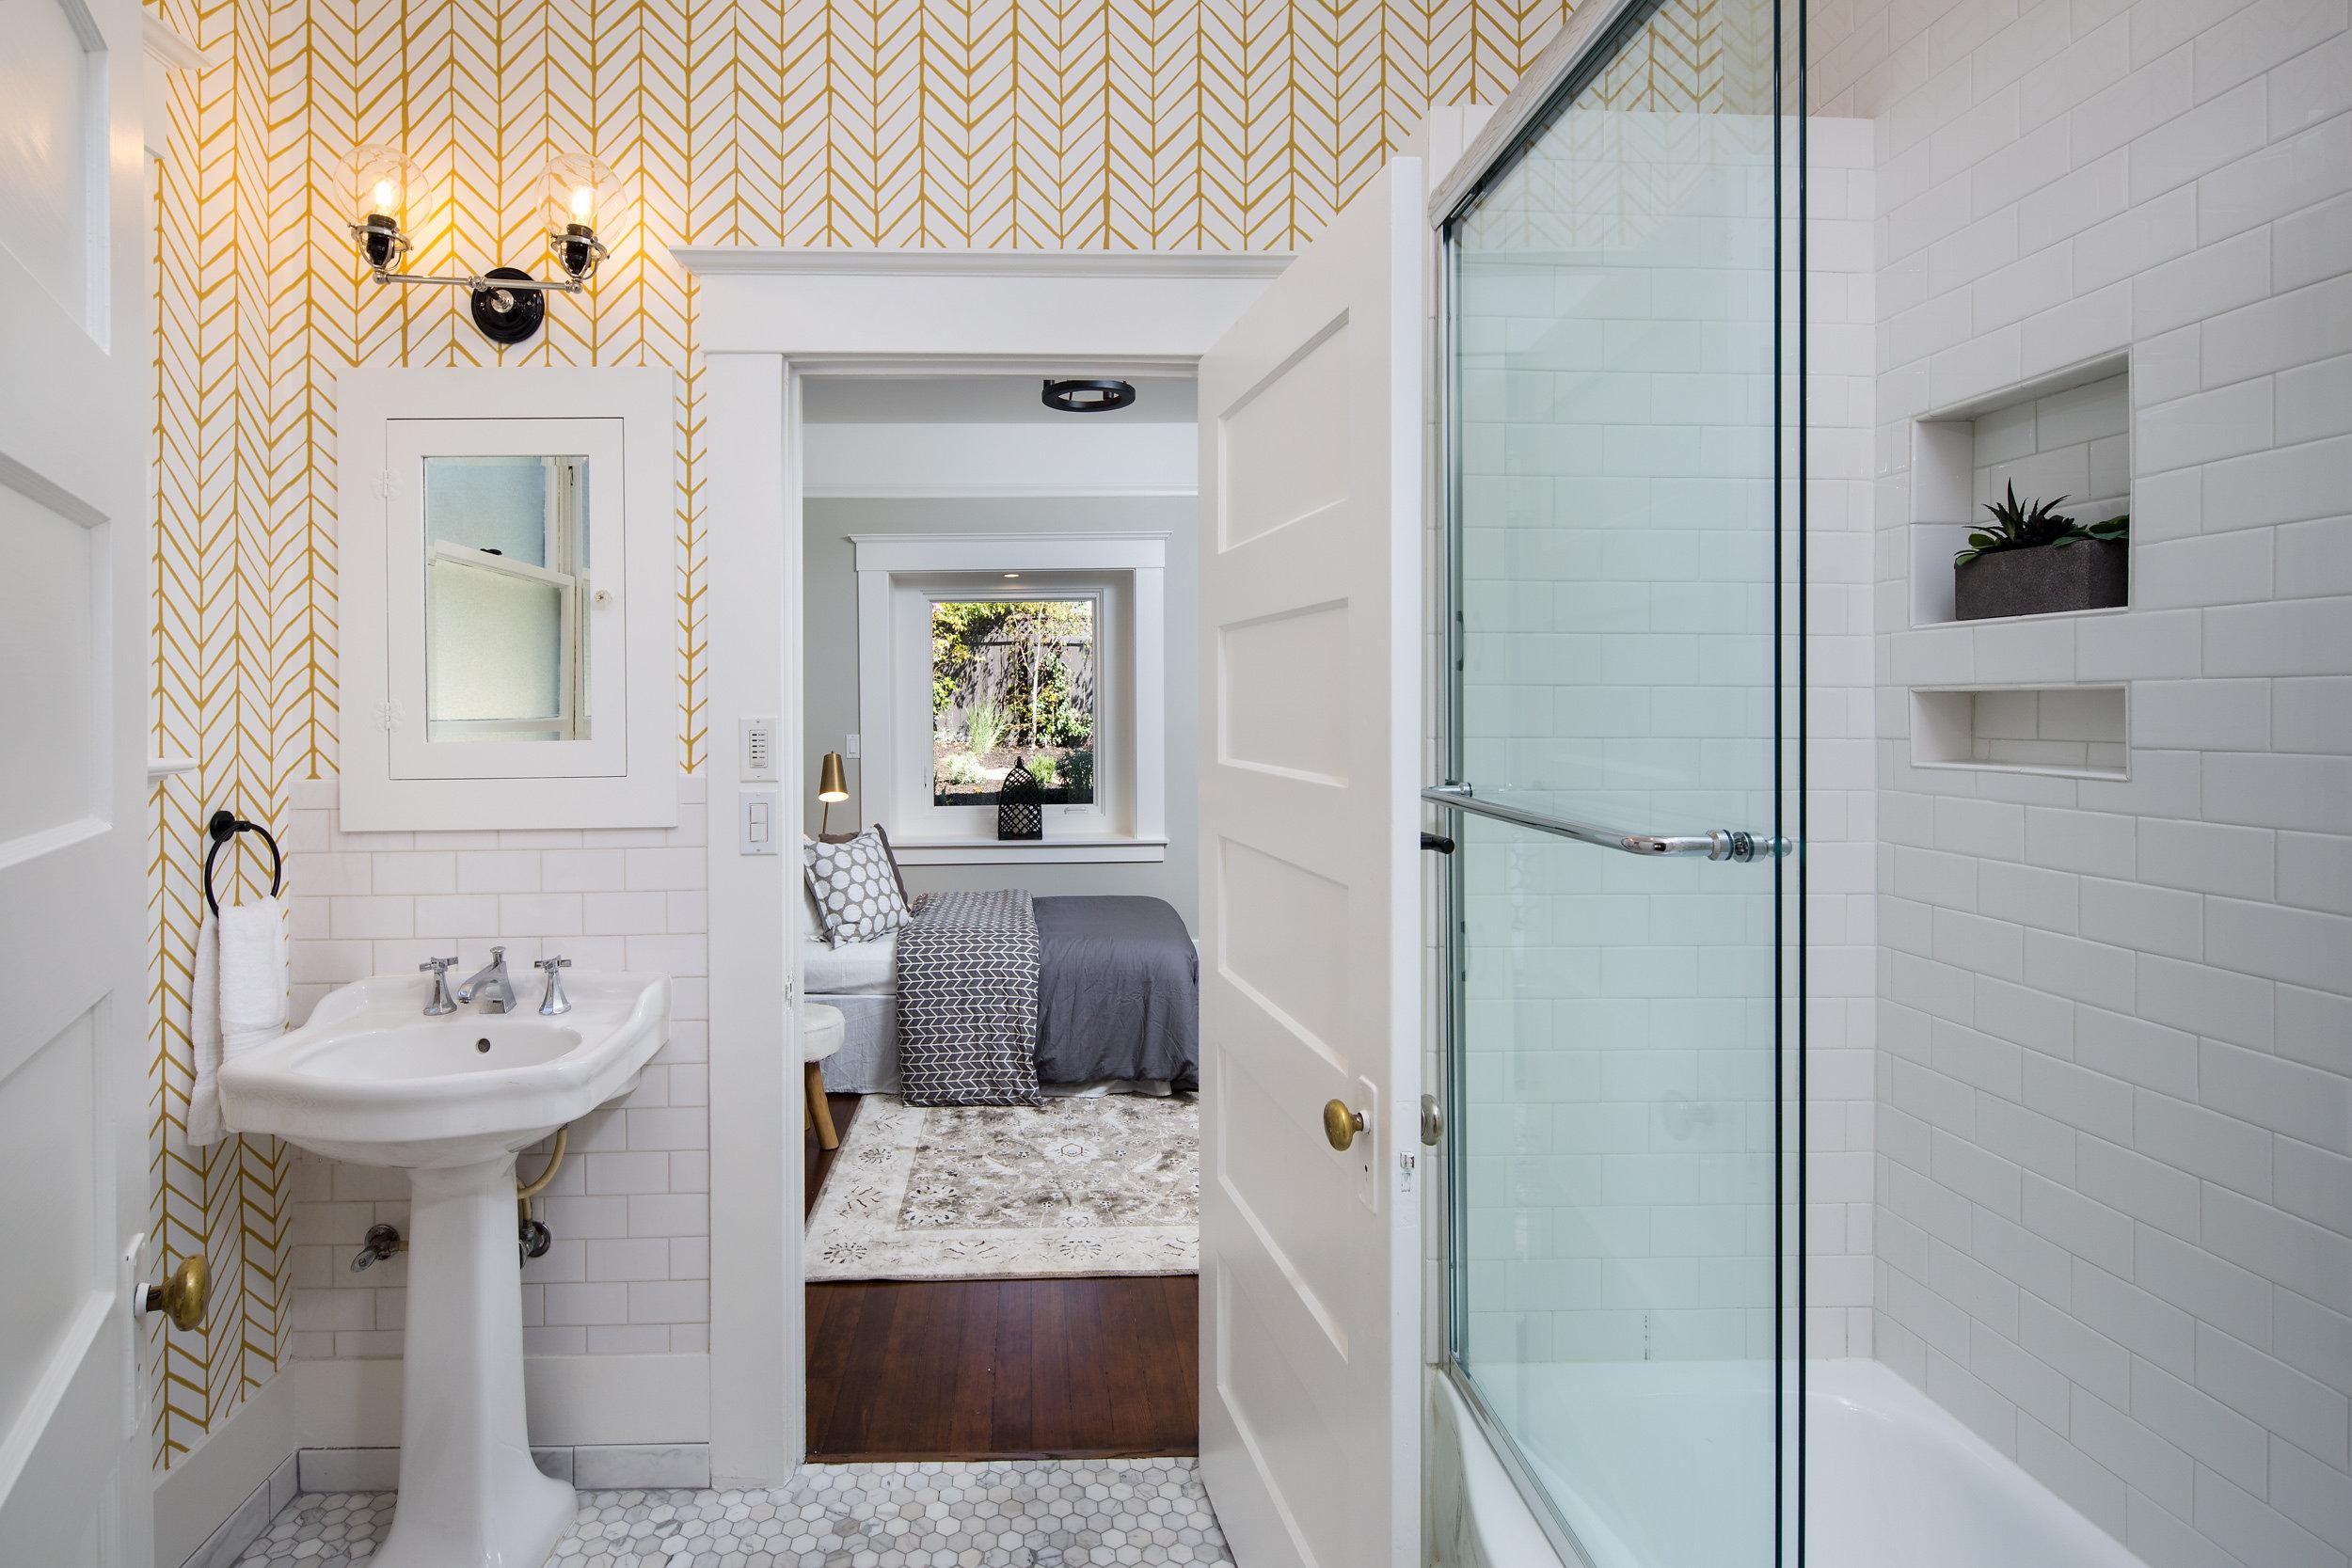 Rockridge, Oakland CA 94618 House for Sale